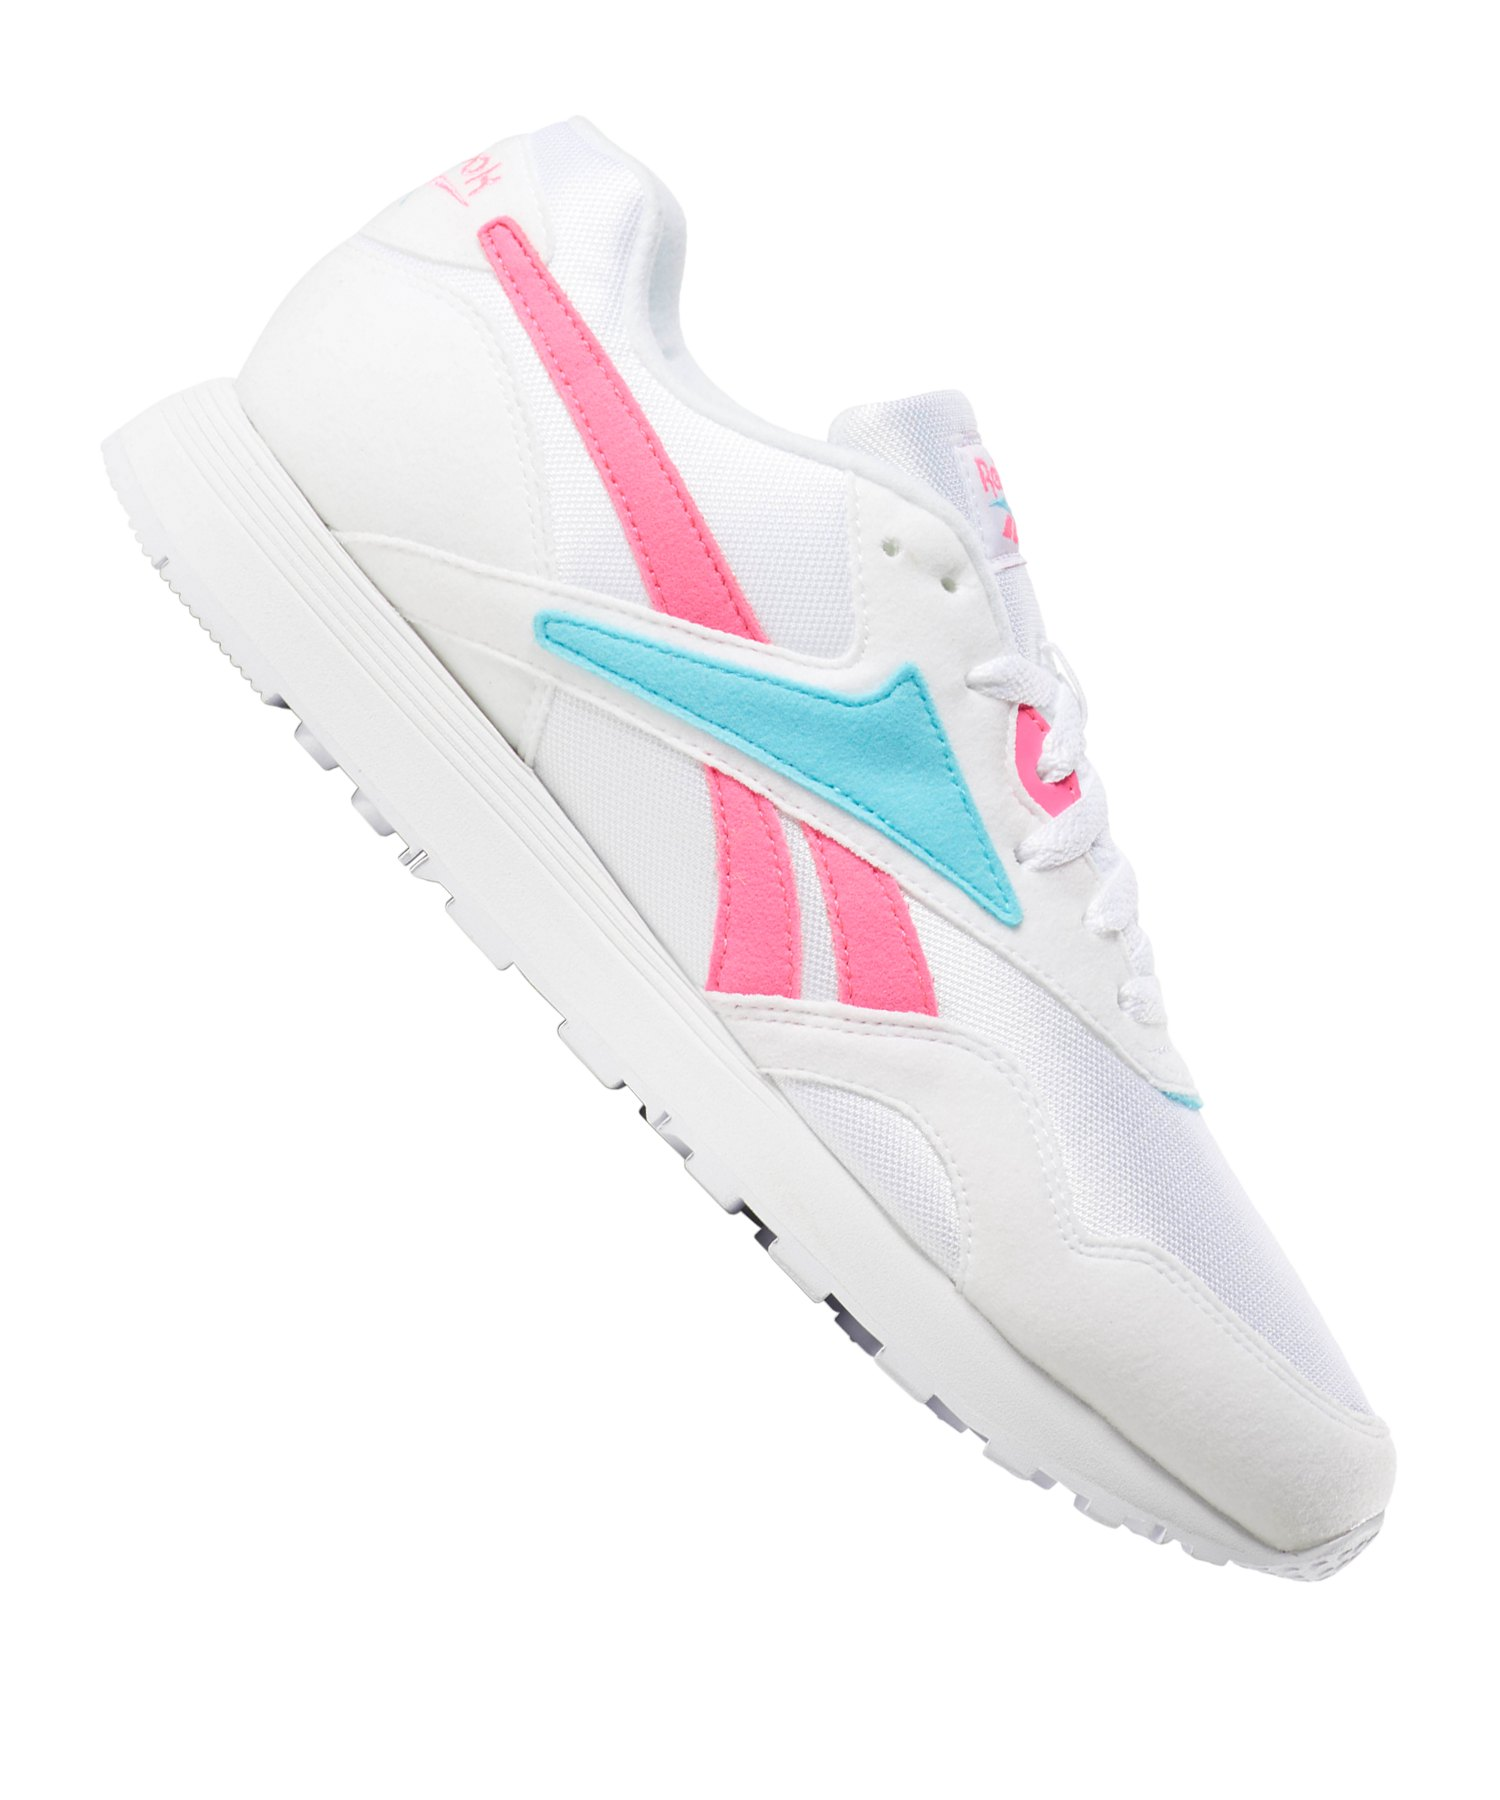 Reebok Rapide MU Sneaker Damen Weiss Pink - weiss